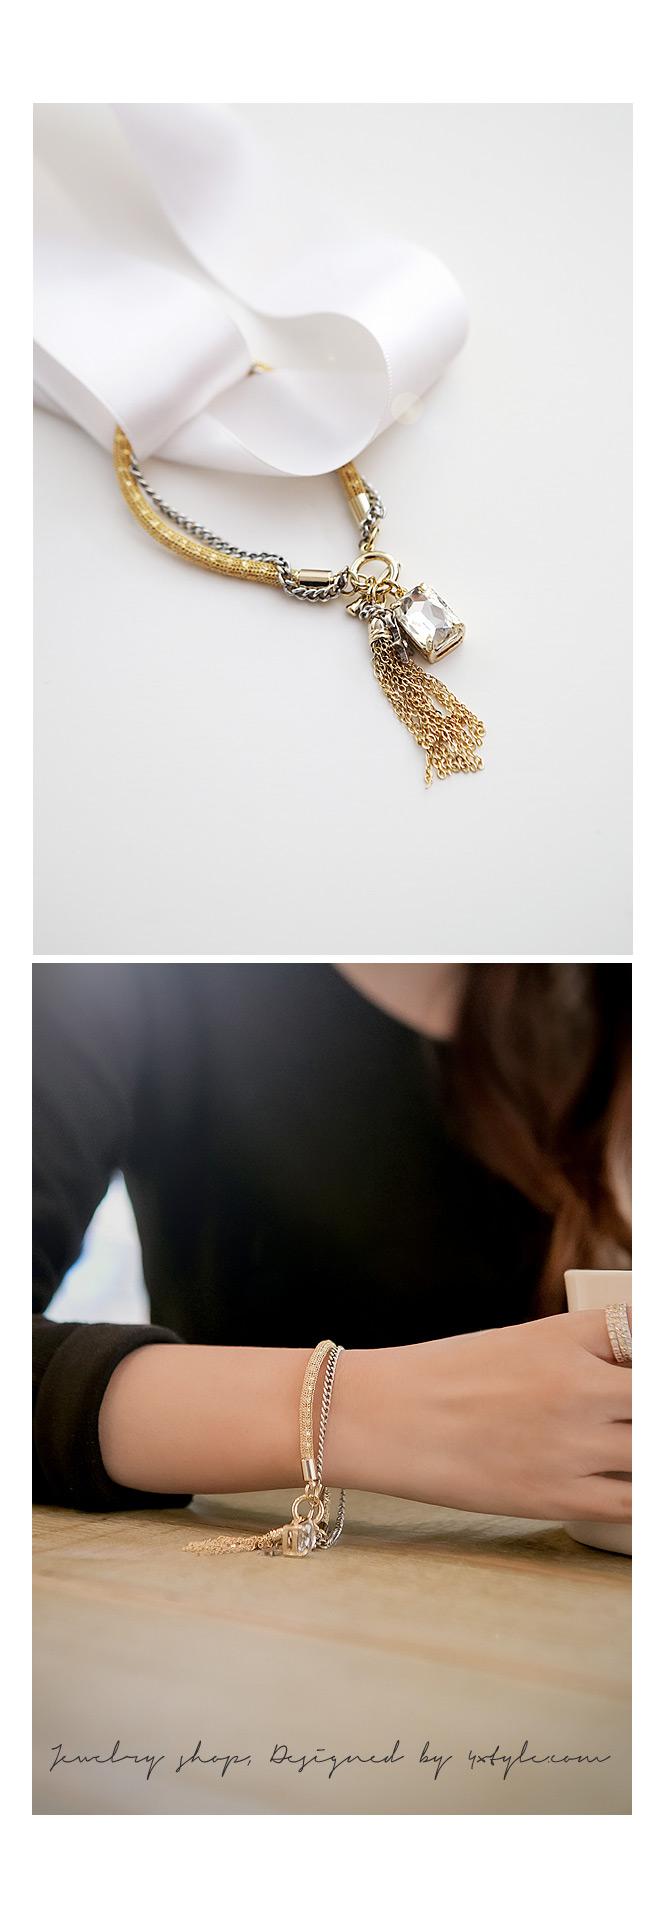 [ 4xtyle ] MIX CHAIN TASSEL BRACELET